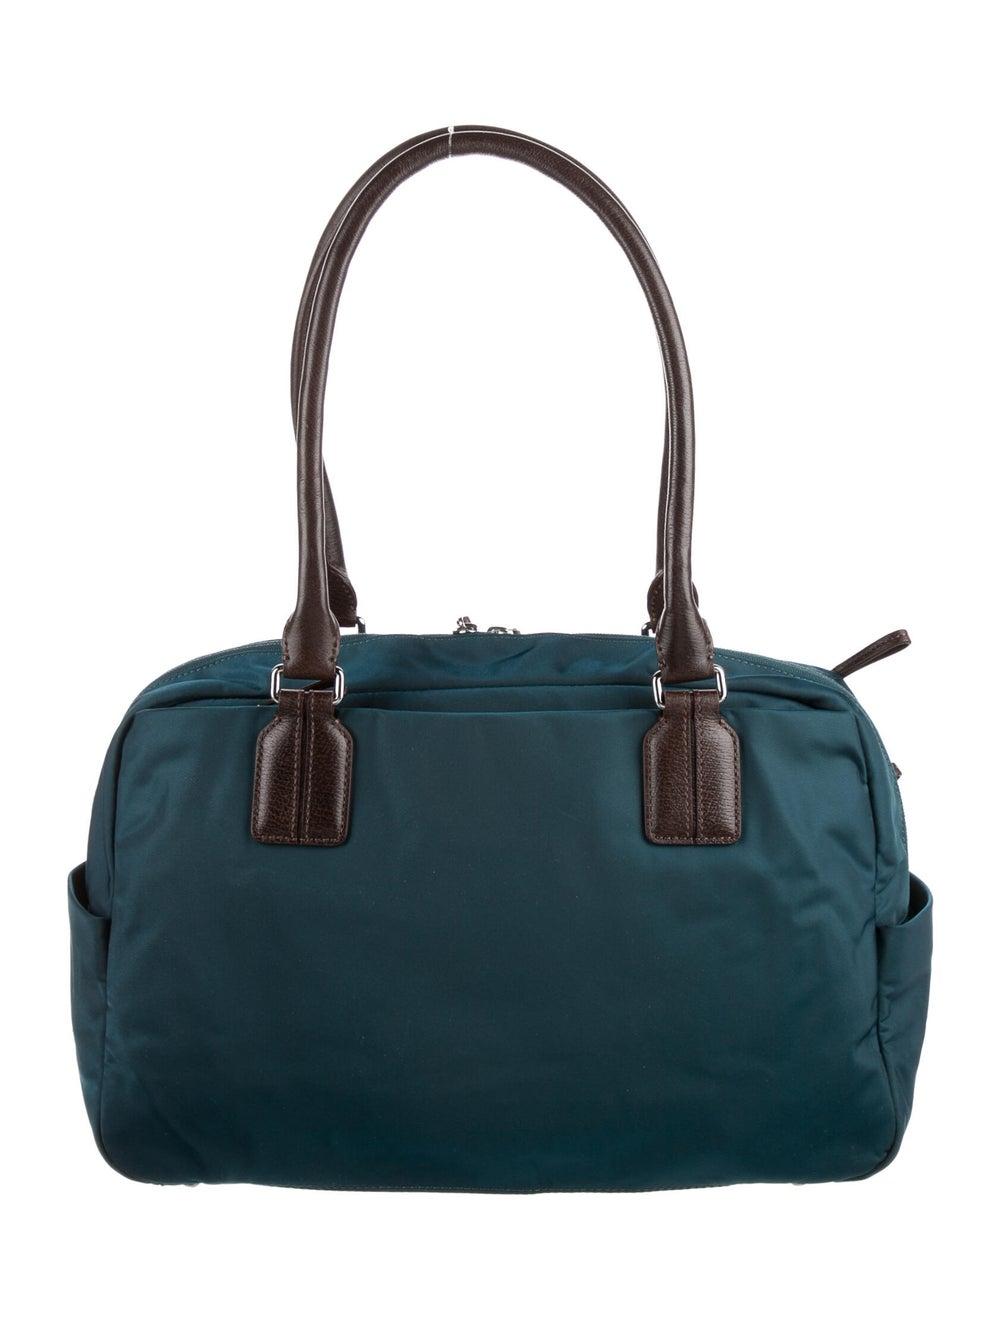 Tumi Nylon Shoulder Bag Blue - image 4